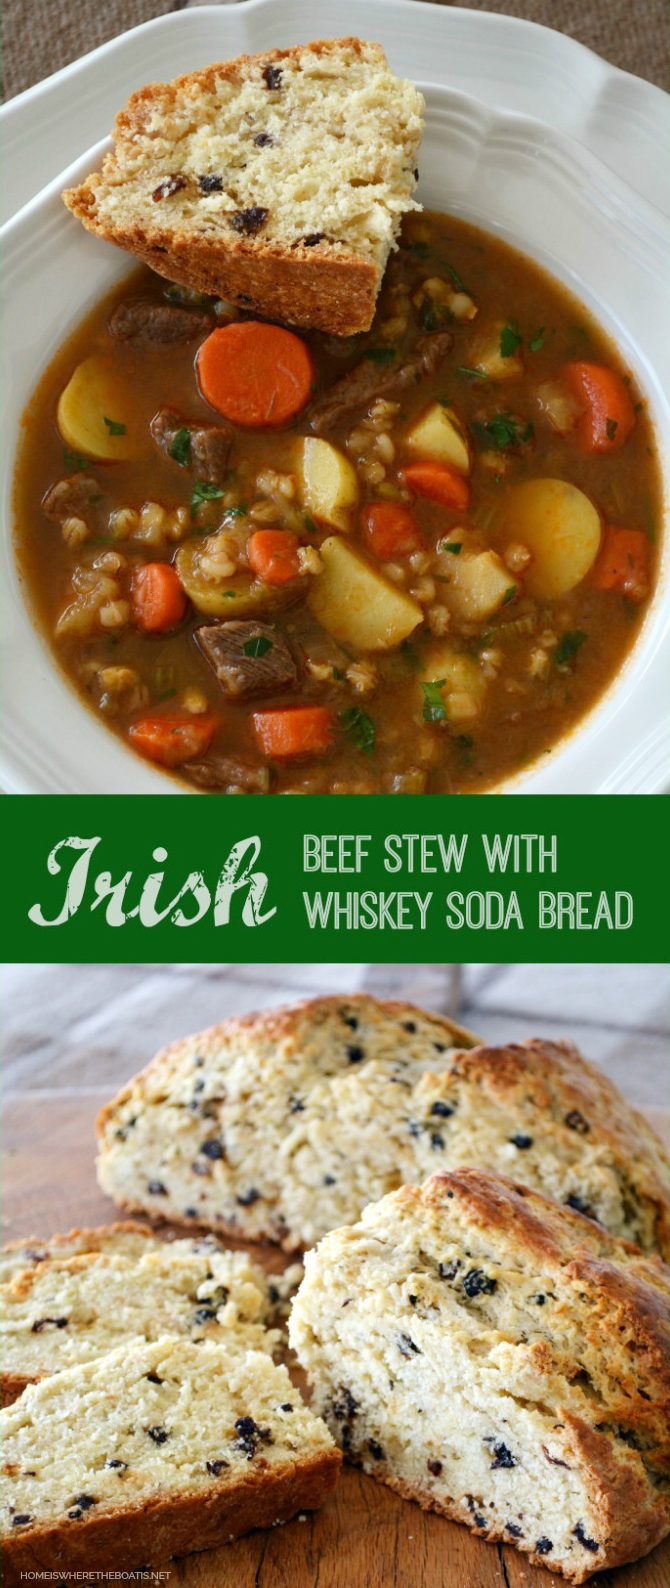 Irish Beef Stew with Irish Whiskey Soda Bread! A delicious stick-to-your-ribs Irish Stew and soda bread recipes | homeiswheretheboatis.net #StPatricksDay #recipe #Irish #sodabread